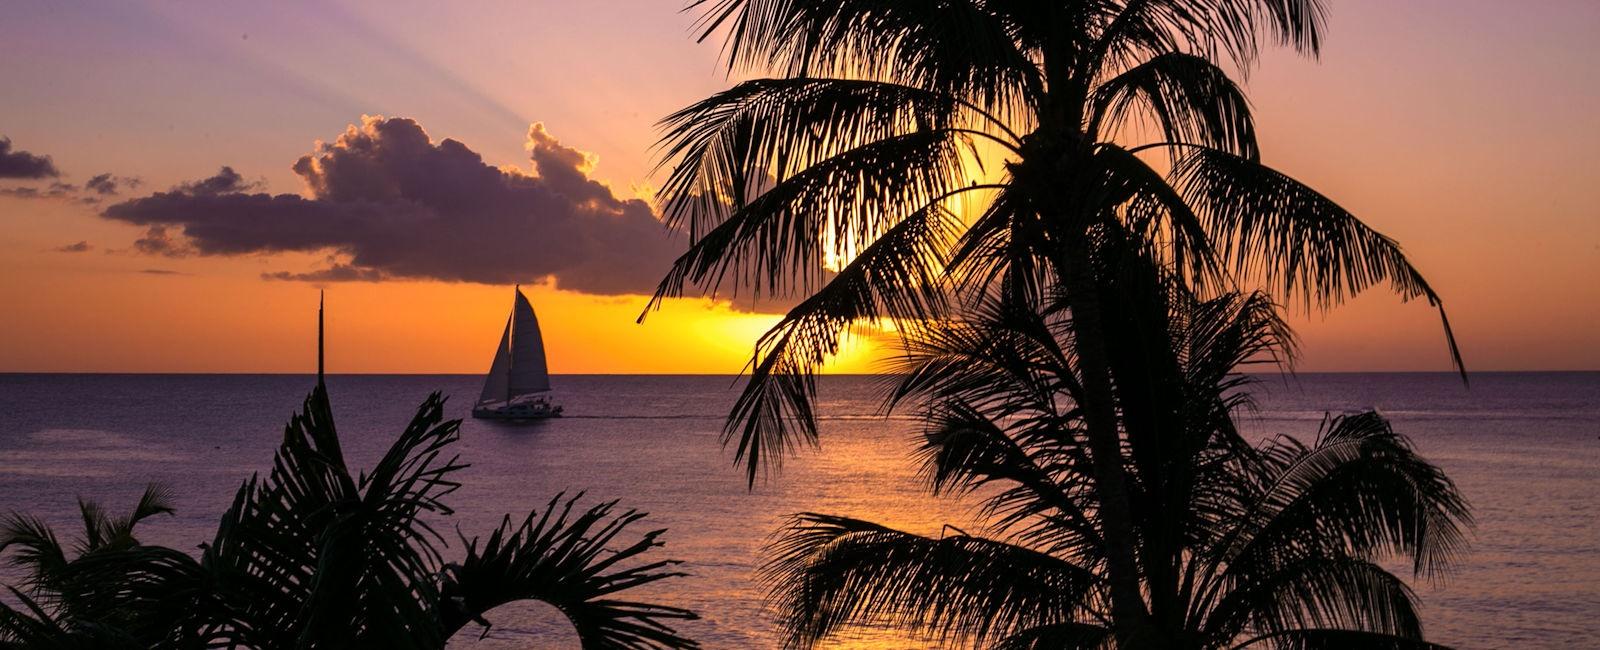 porters, St James, Barbados